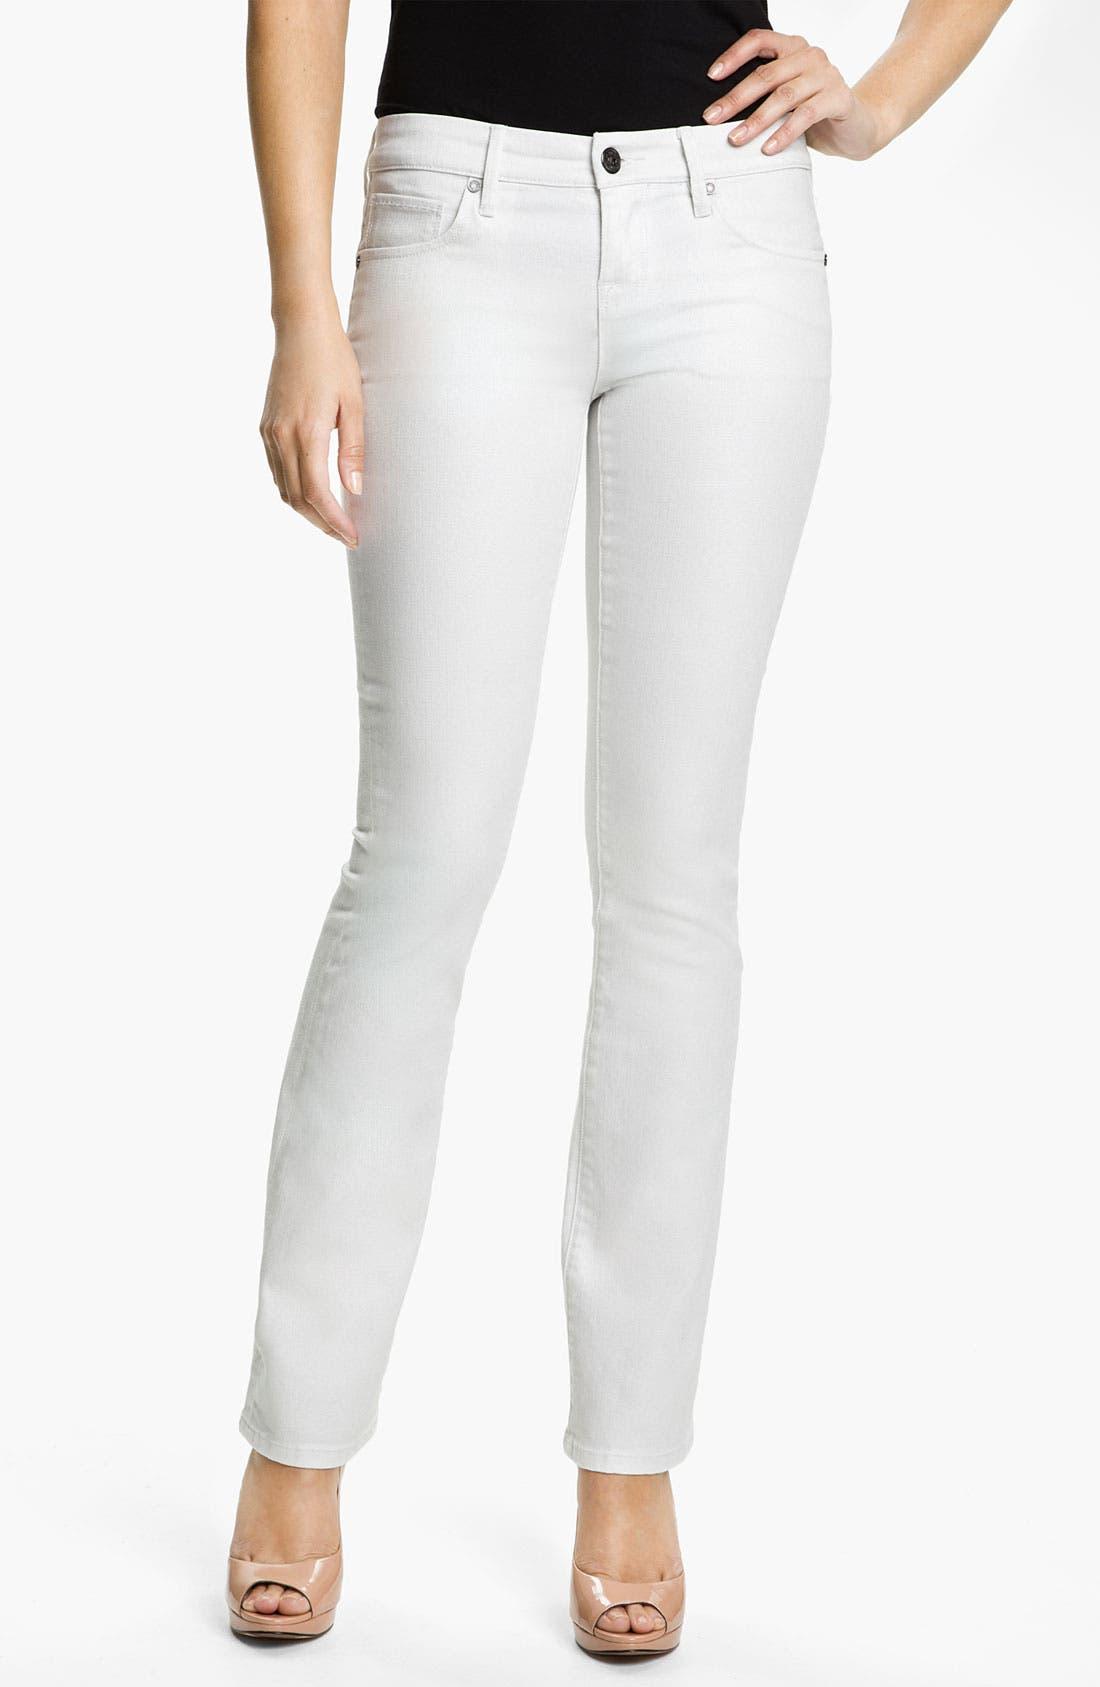 Alternate Image 1 Selected - Isaac Mizrahi Jeans 'Skylar' Slim Bootcut Jeans